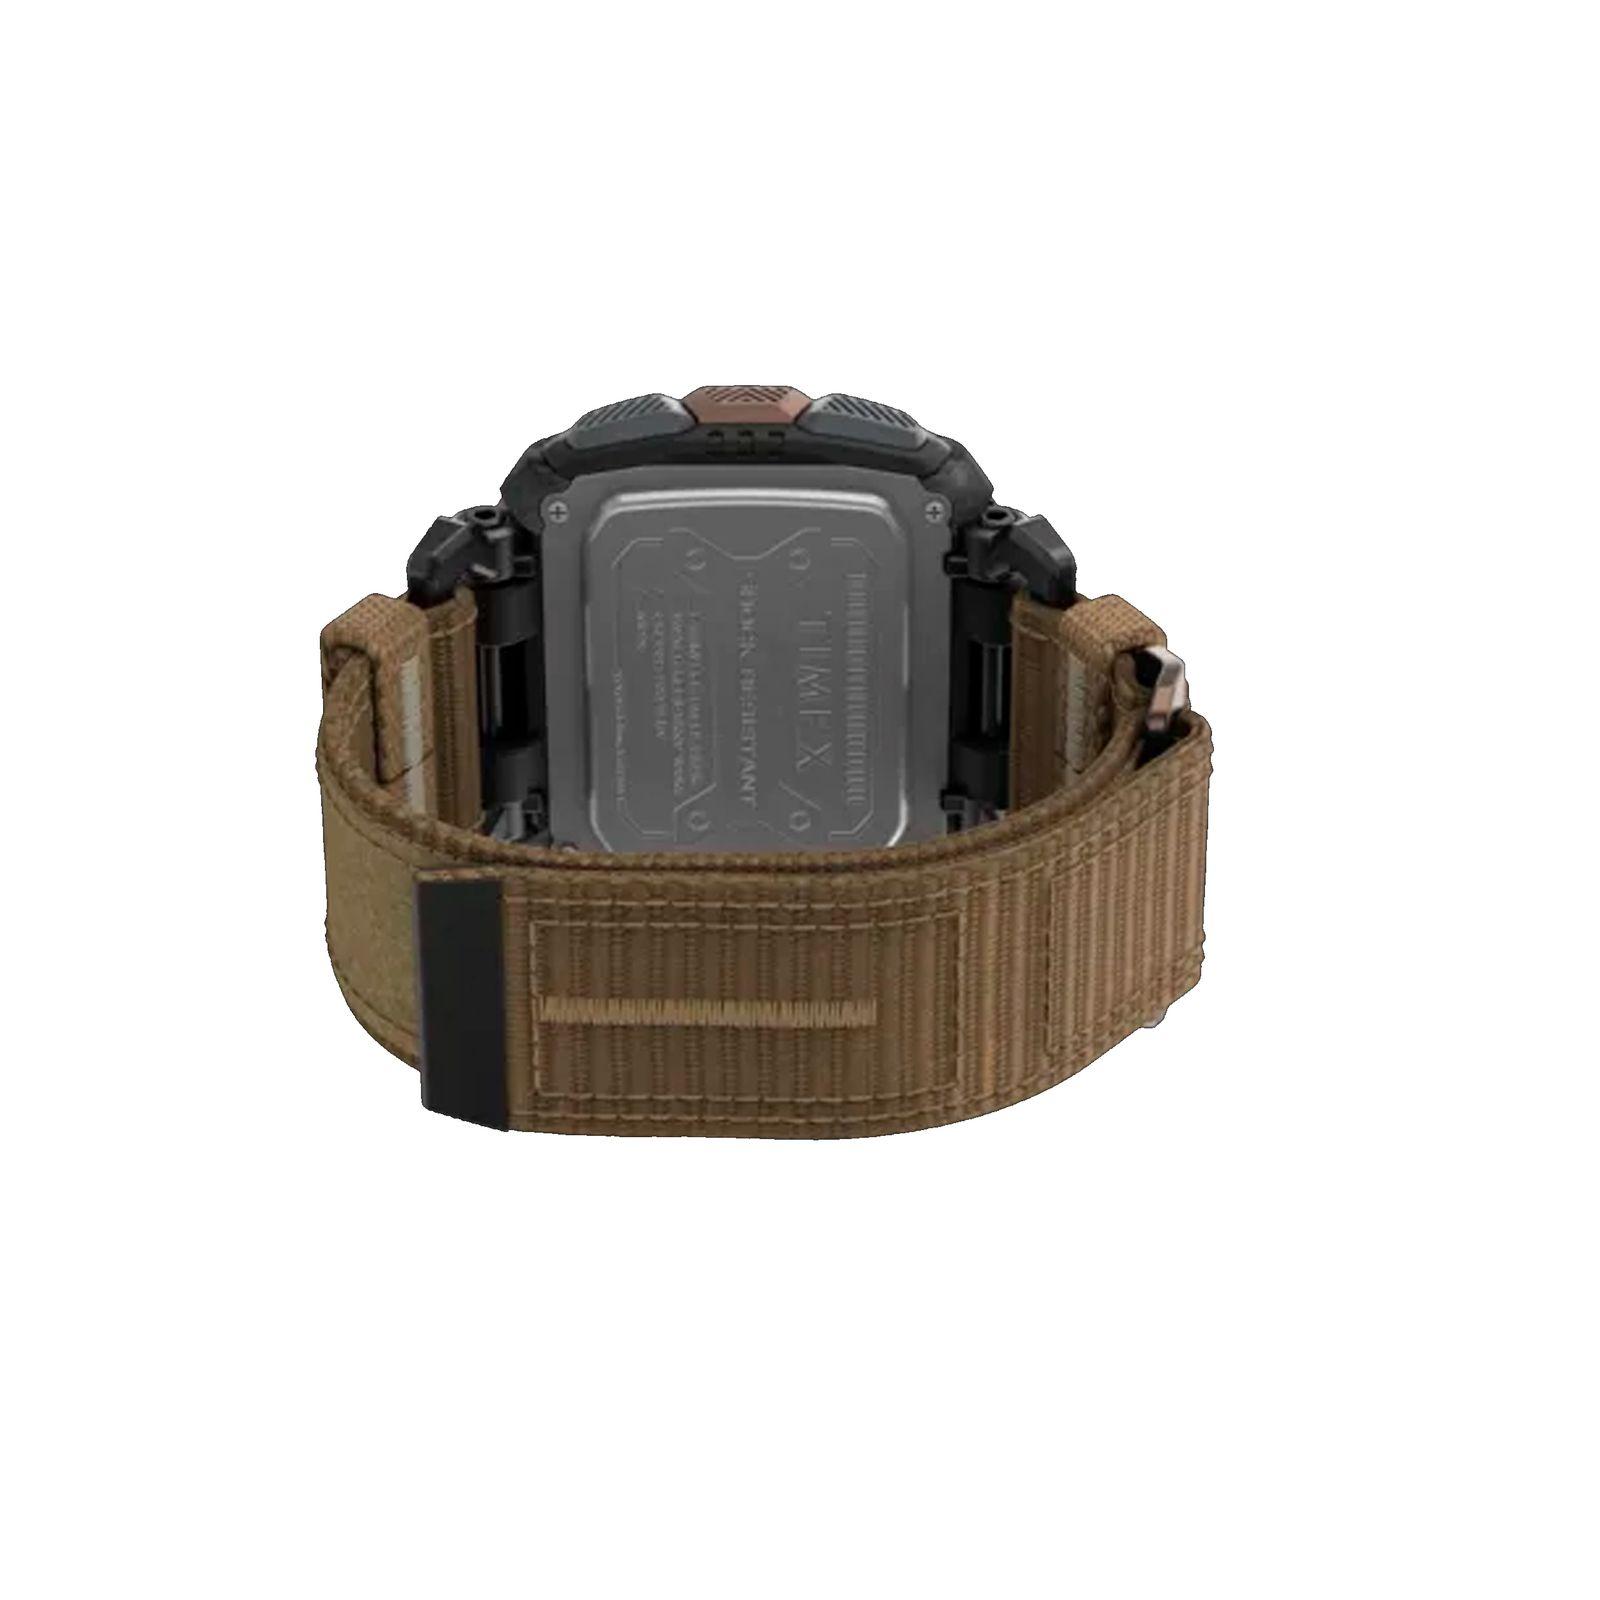 ساعت مچی دیجیتال مردانه تایمکس مدل TW5M28600 -  - 2